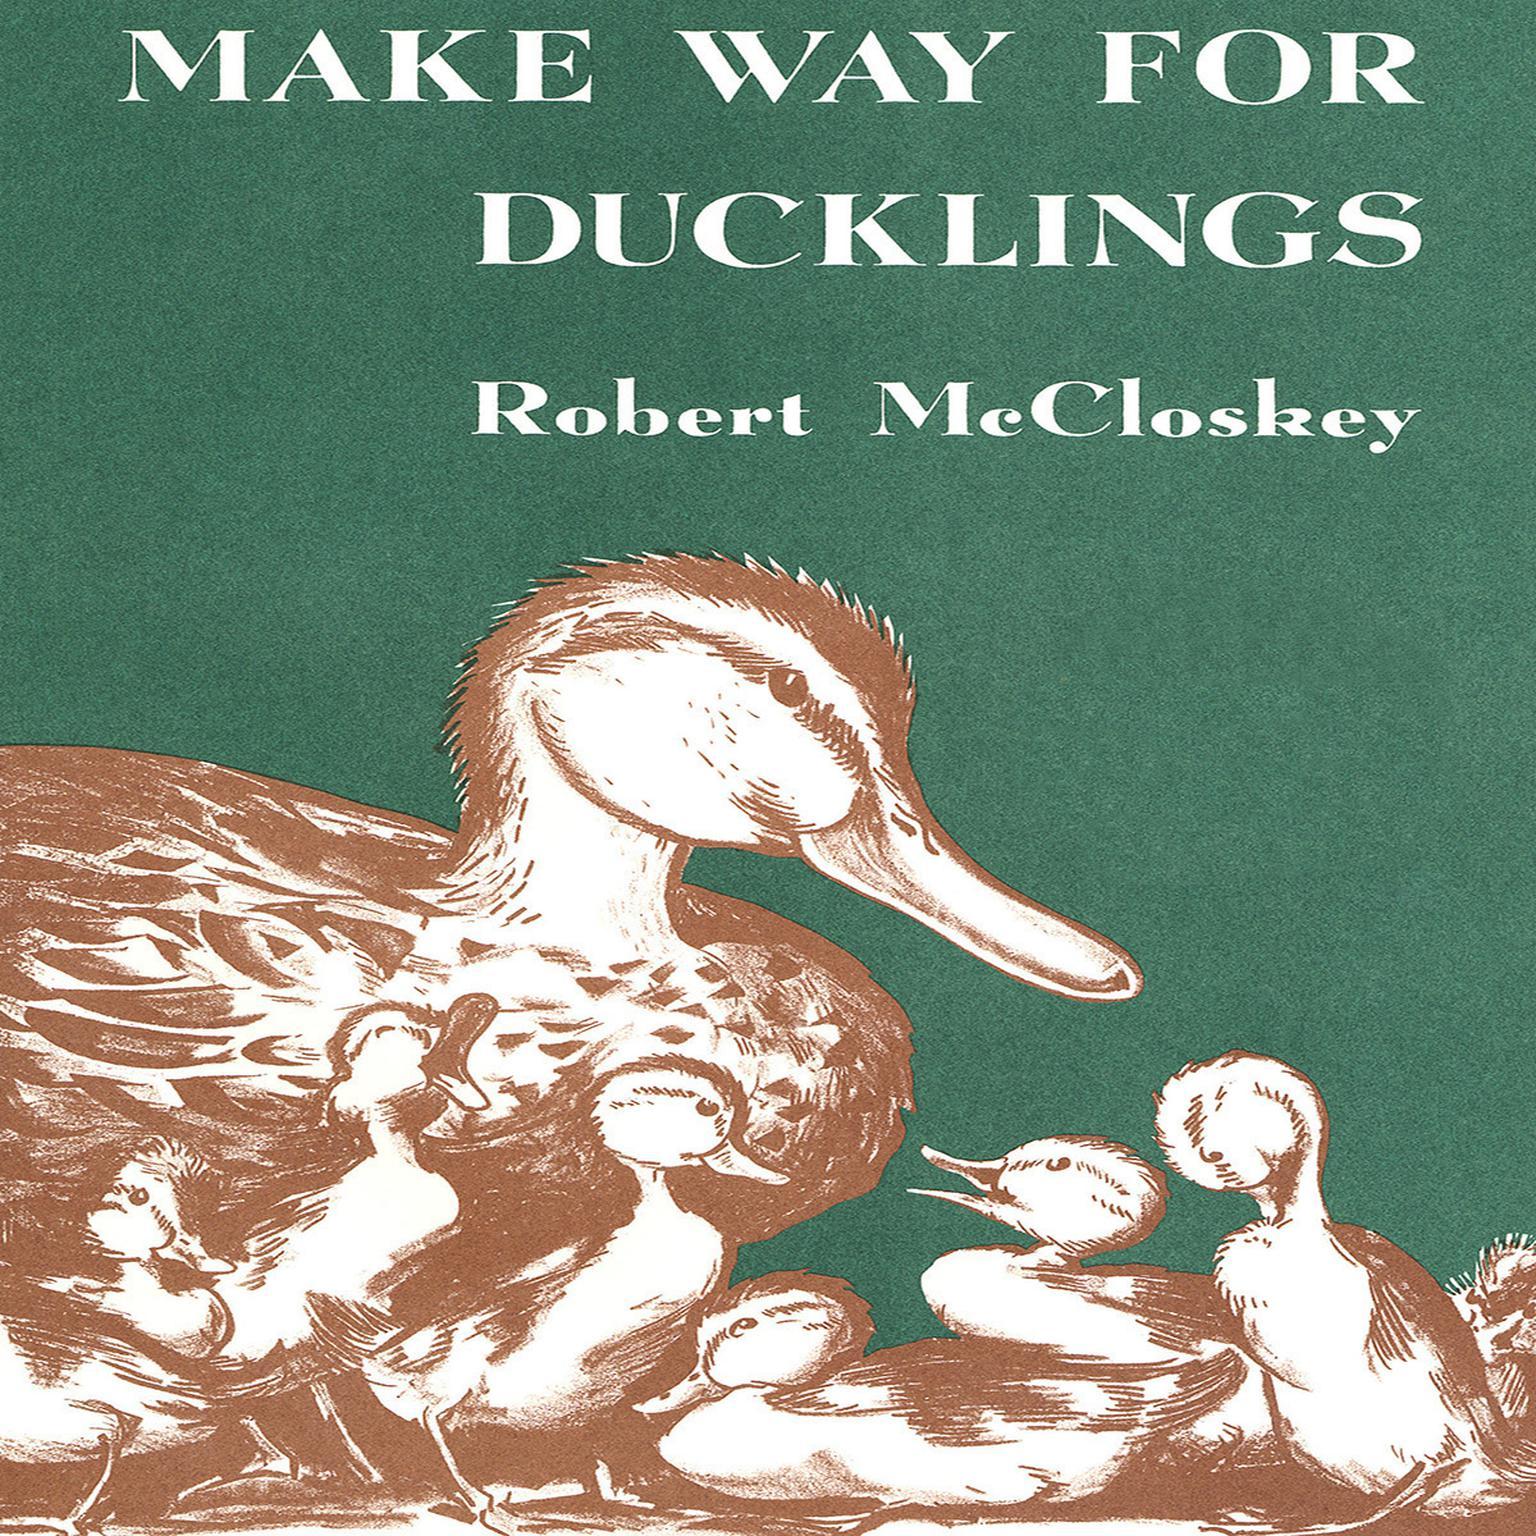 Make Way for Ducklings Audiobook, by Robert McCloskey